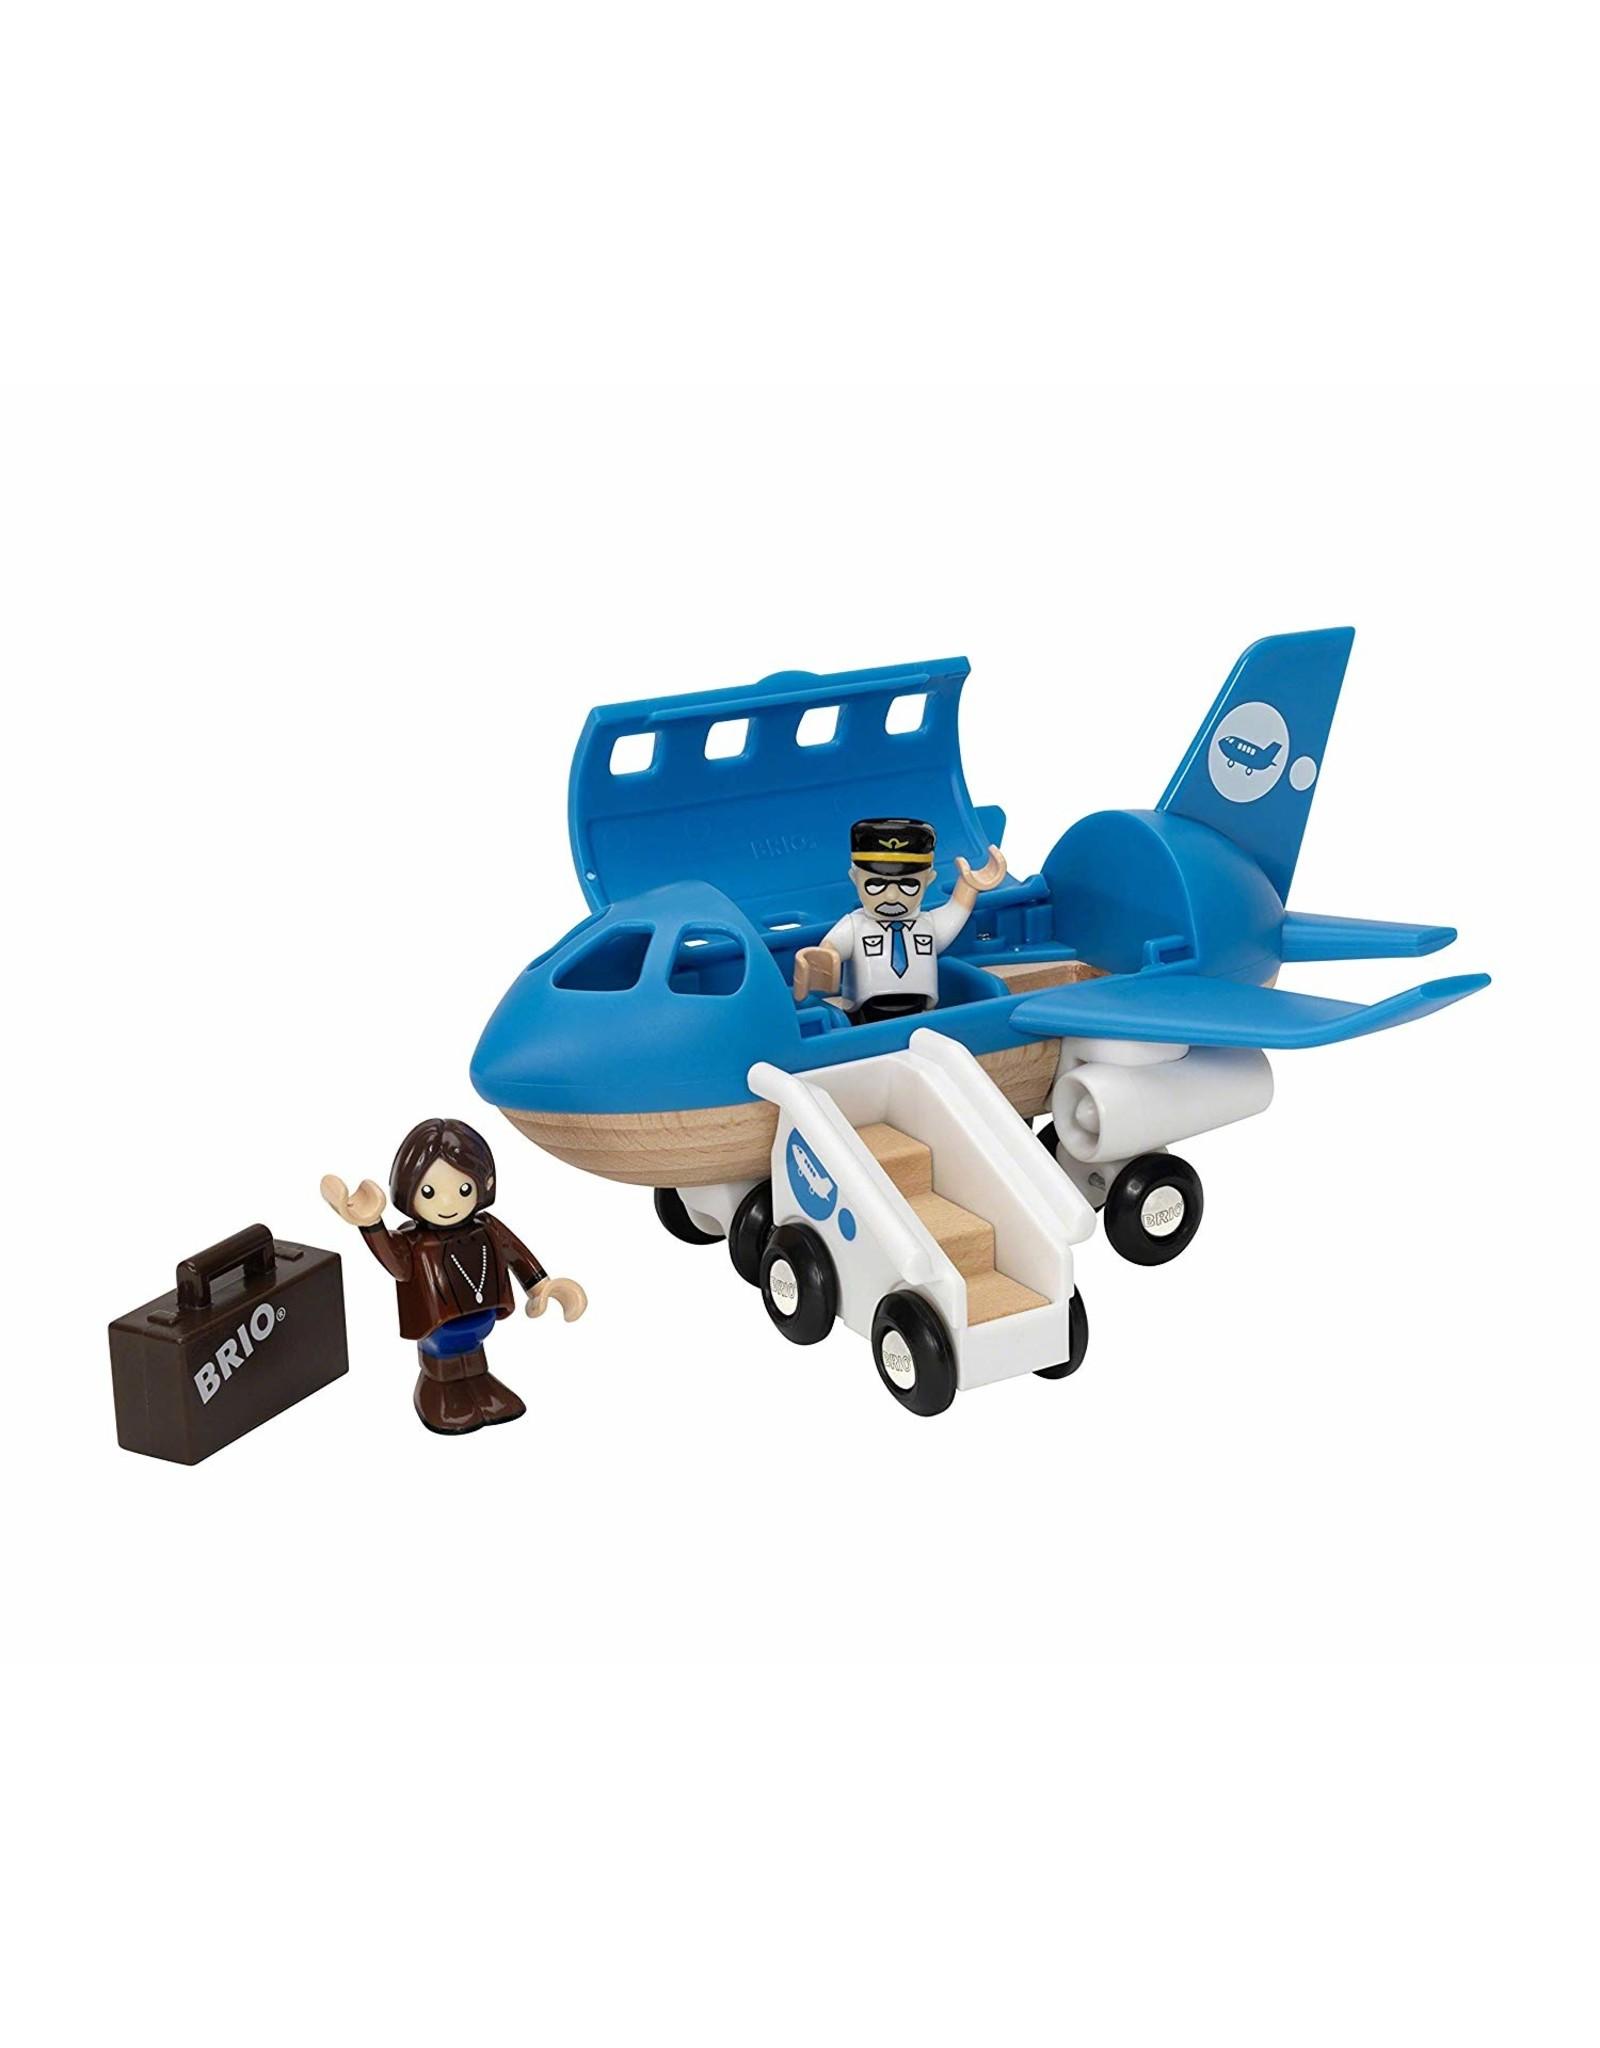 Brio Airplane